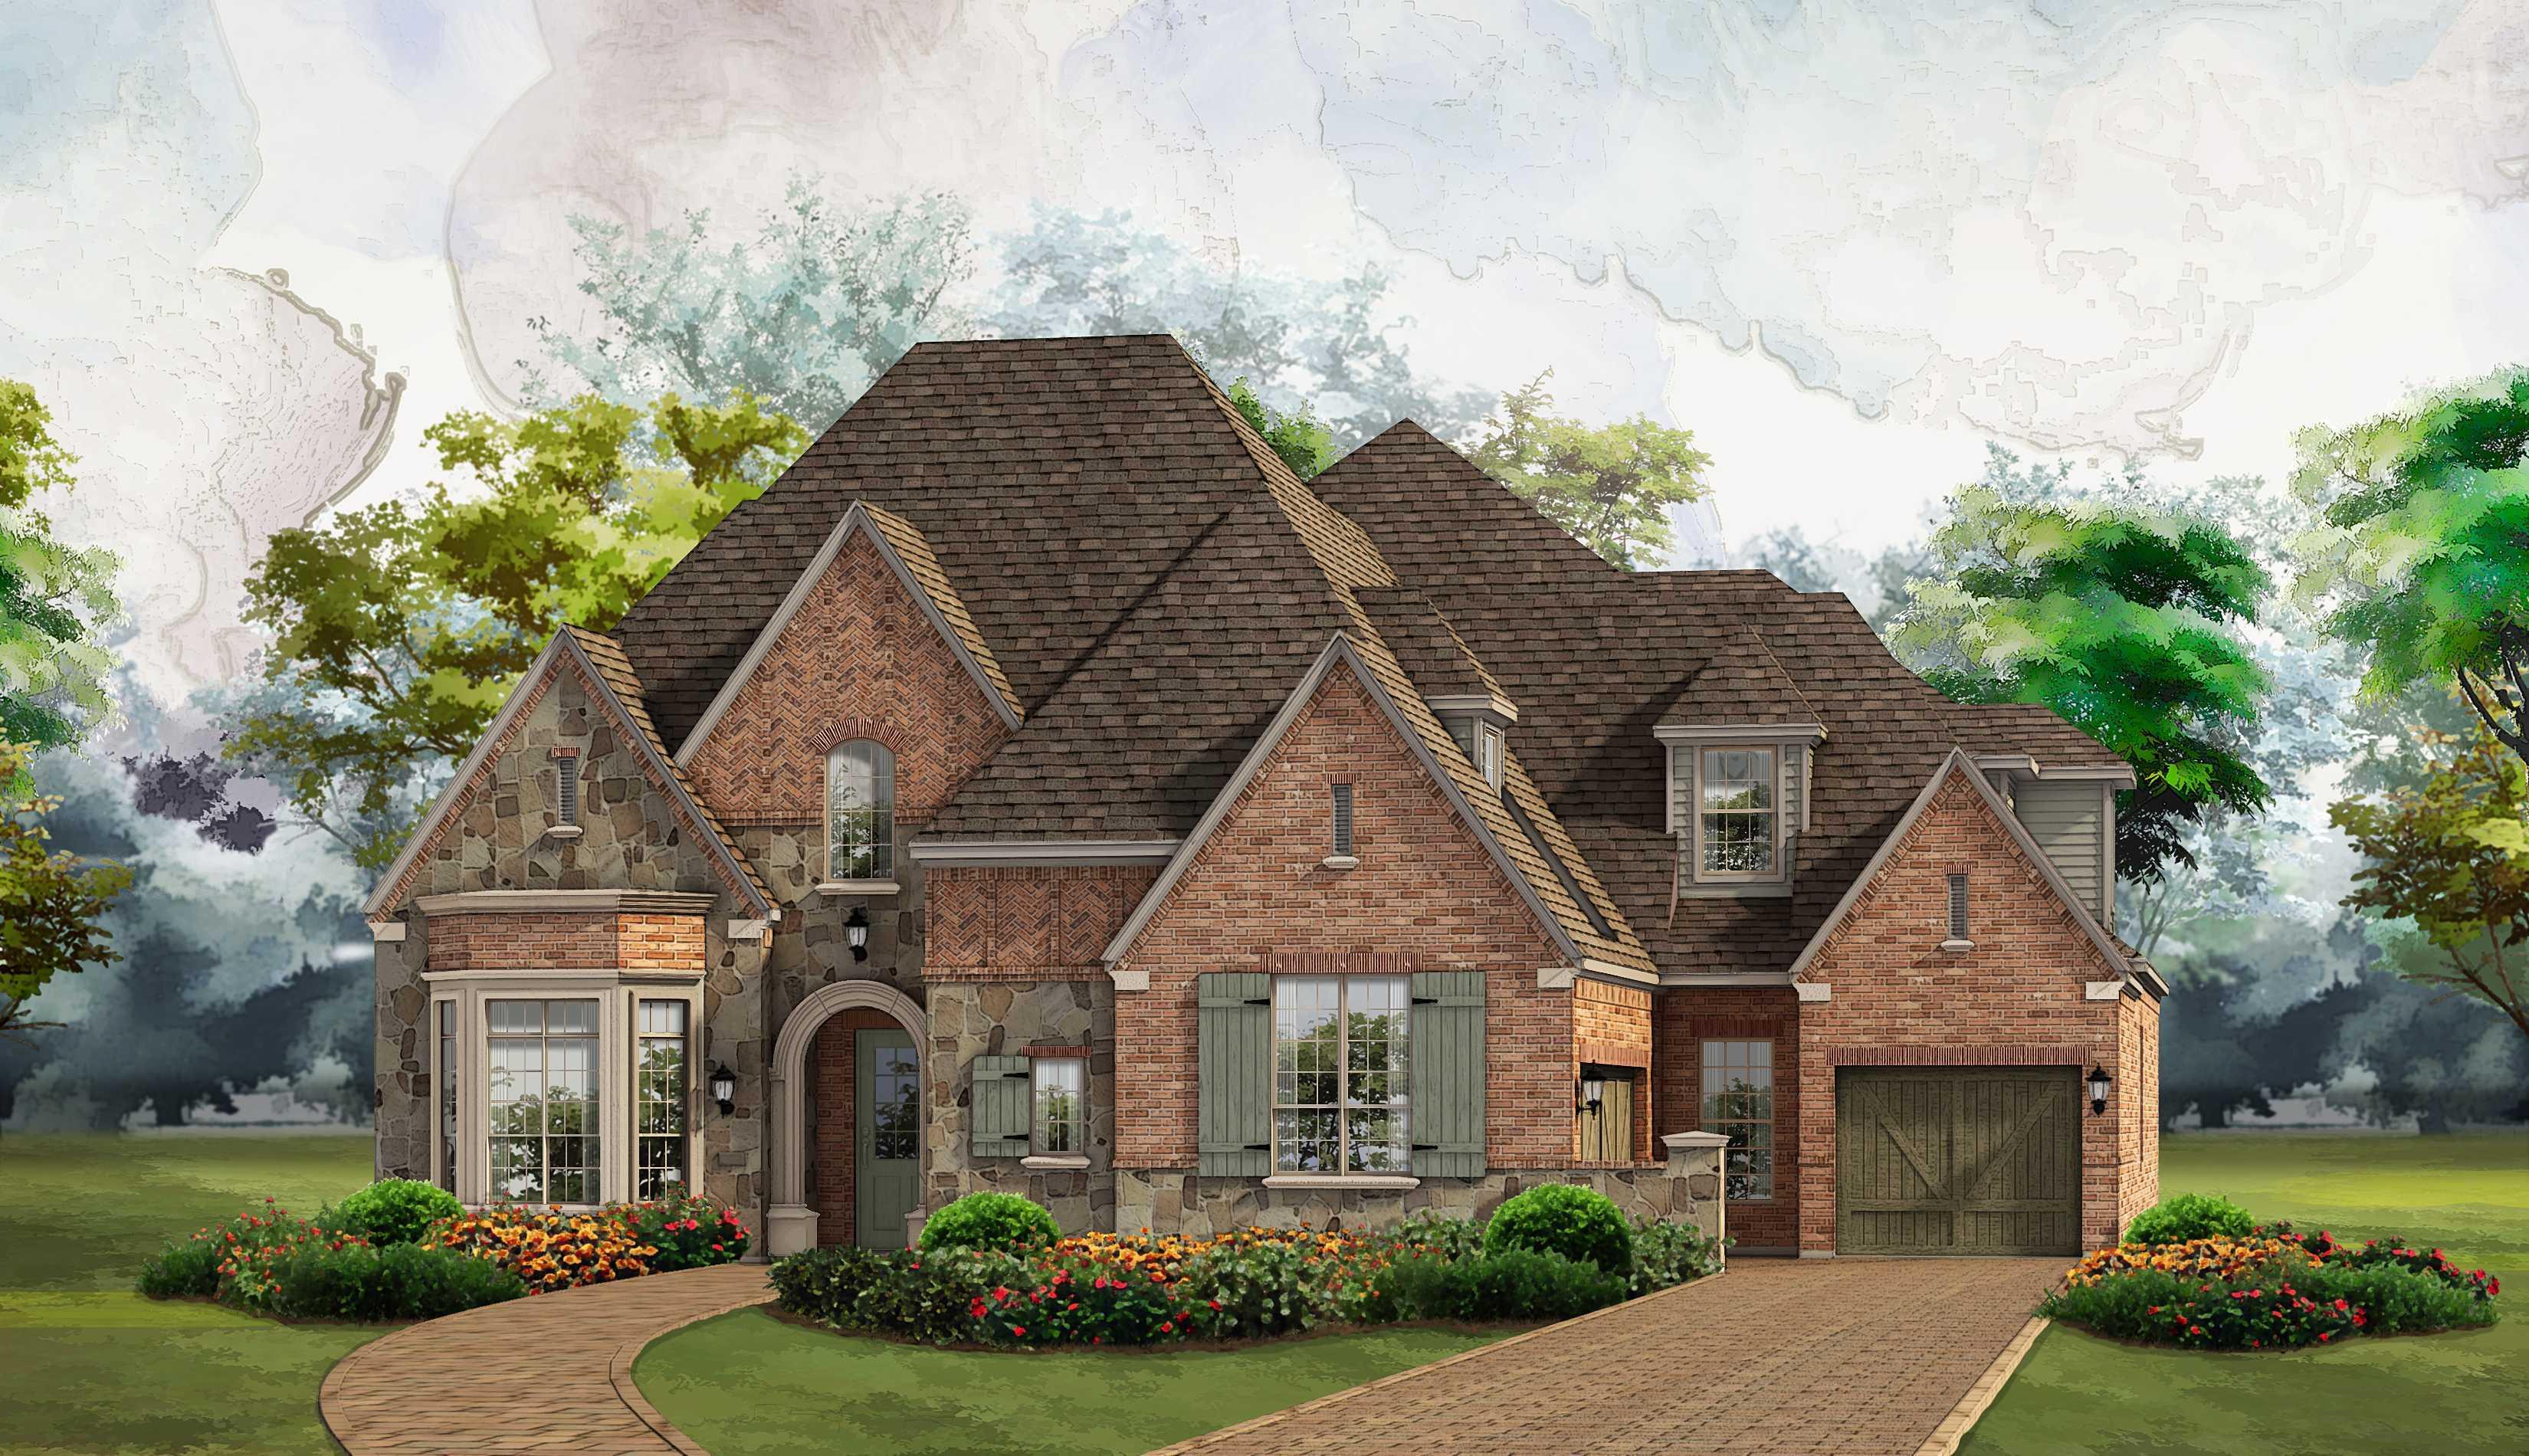 Single Family for Sale at Regency Park - Plan 4626 4012 Baldomera Street Flower Mound, Texas 75022 United States